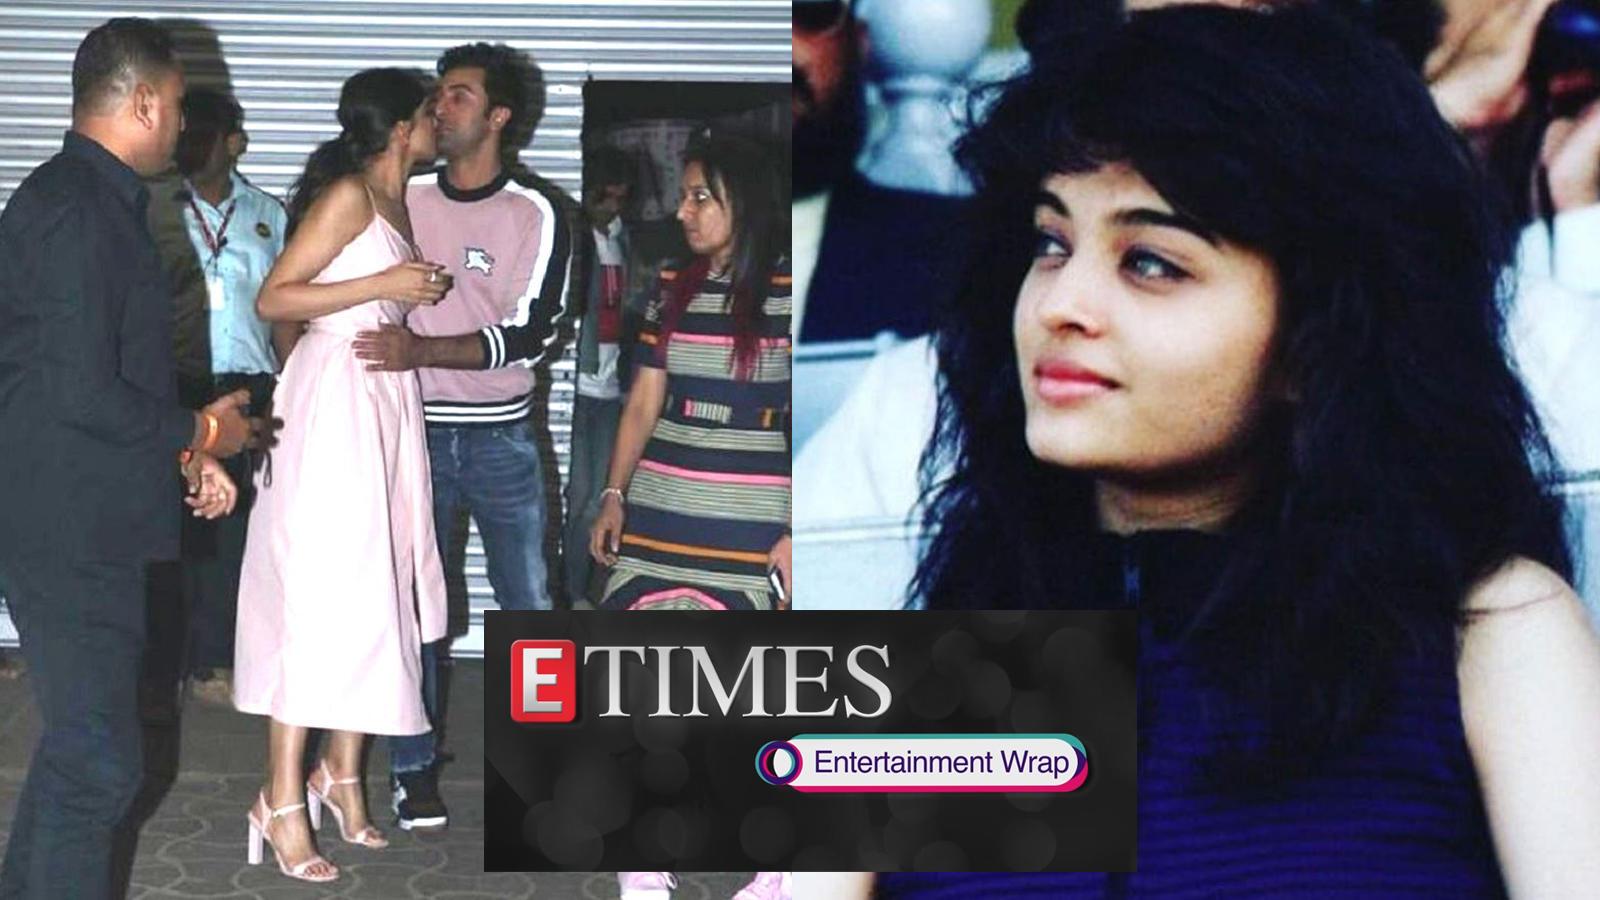 deepika-padukone-and-ranbir-kapoor-greet-each-other-aishwarya-rai-bachchans-throwback-pic-goes-viral-and-more